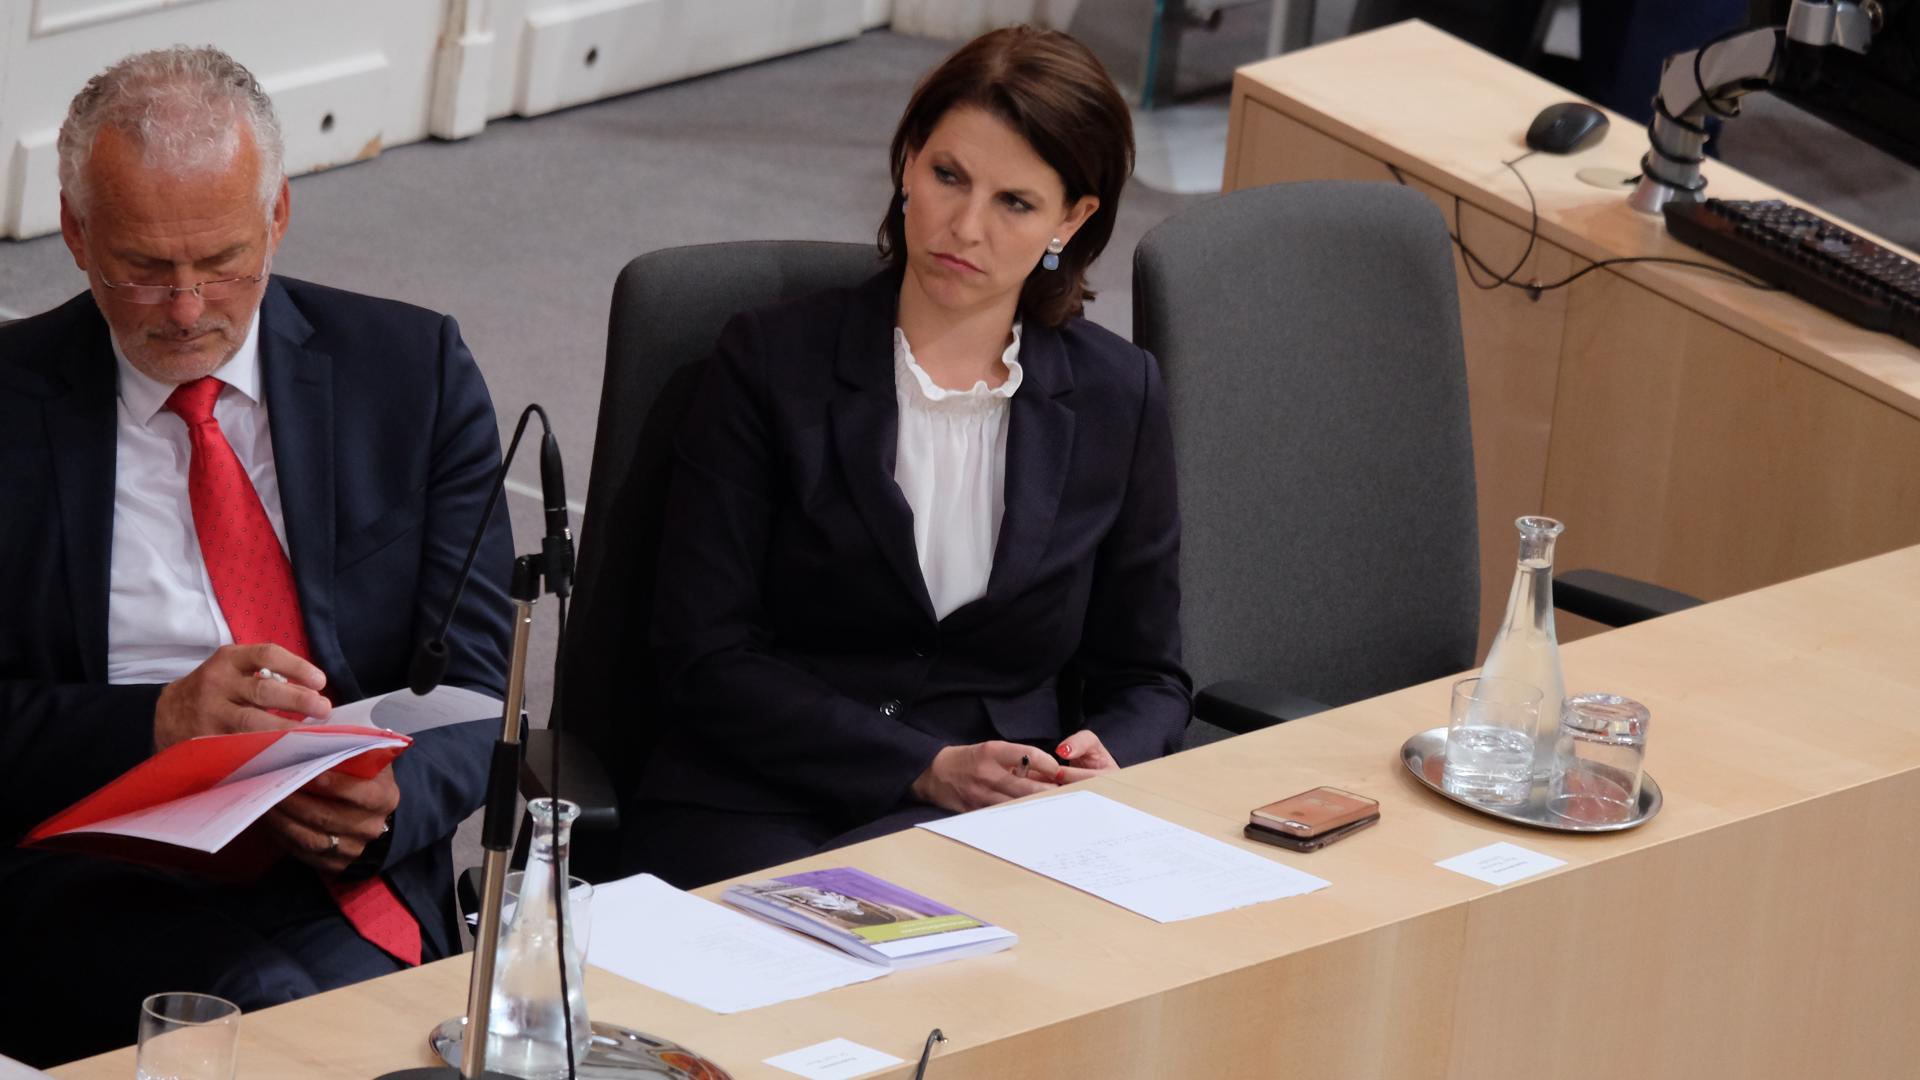 Edtstadler-Karoline-Parlament-Wien-ÖVP-Josef Moser-Sebastian Kurz